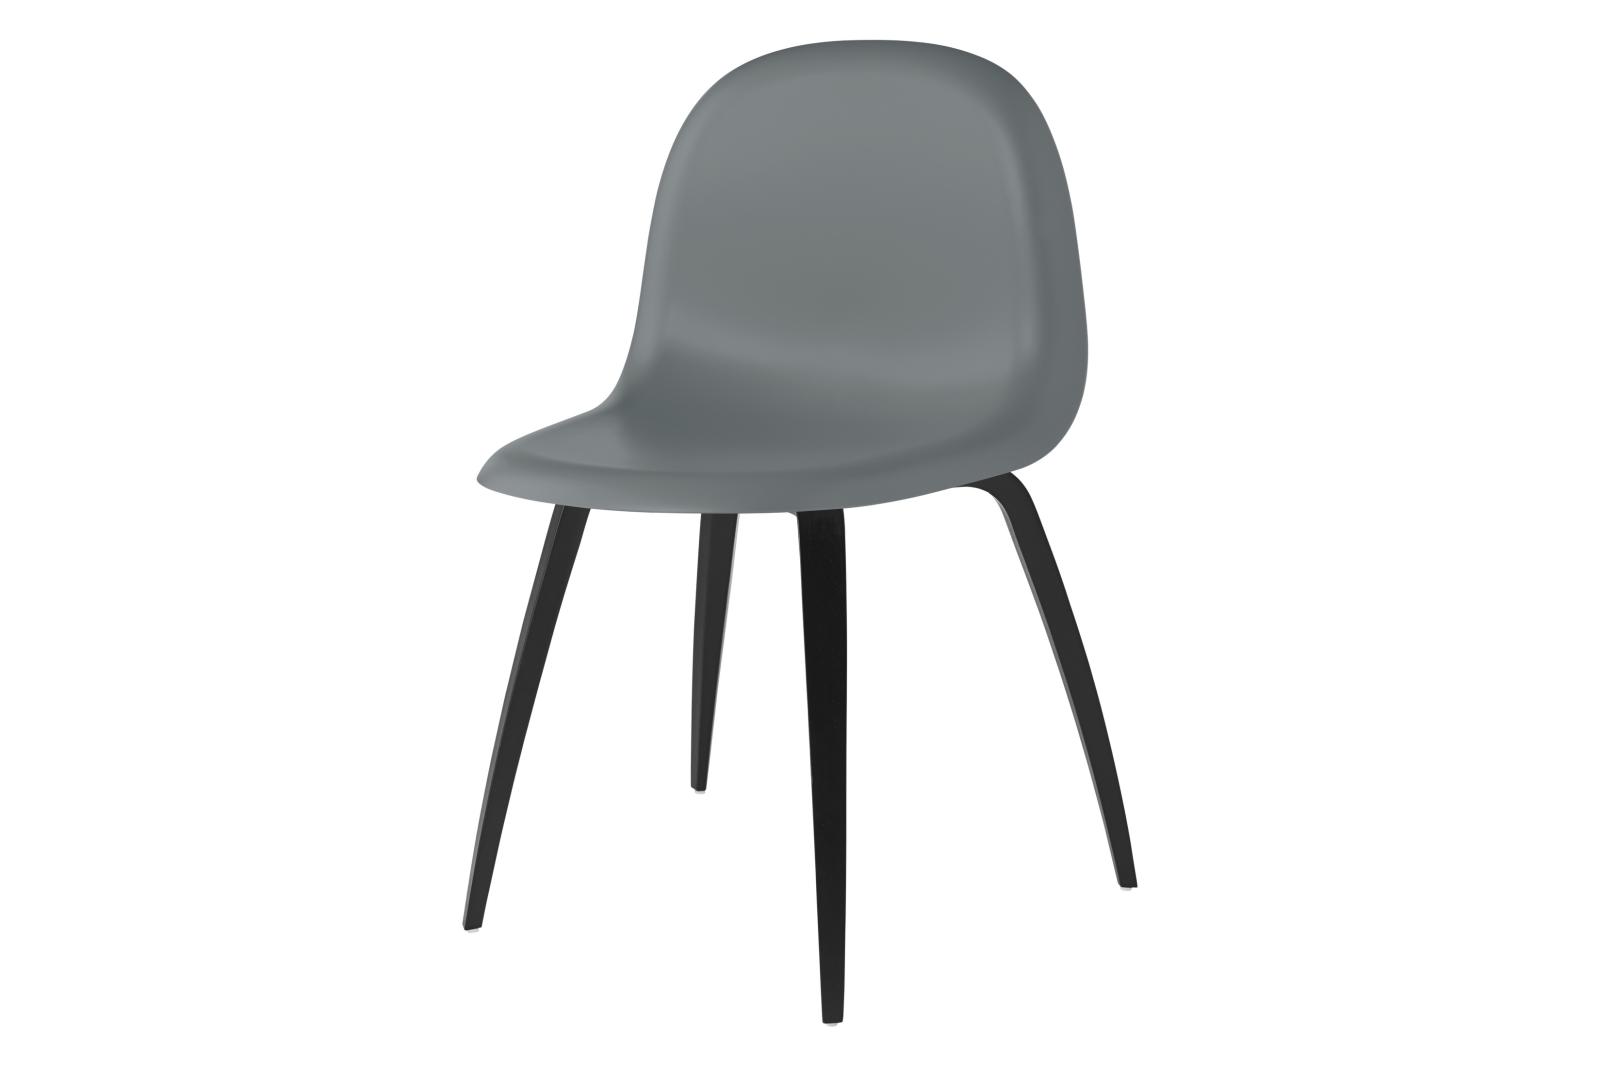 Gubi 3D Wood Base Dining Chair - Unupholstered Gubi HiRek Rainy Grey, Gubi Wood Black Stained Beech